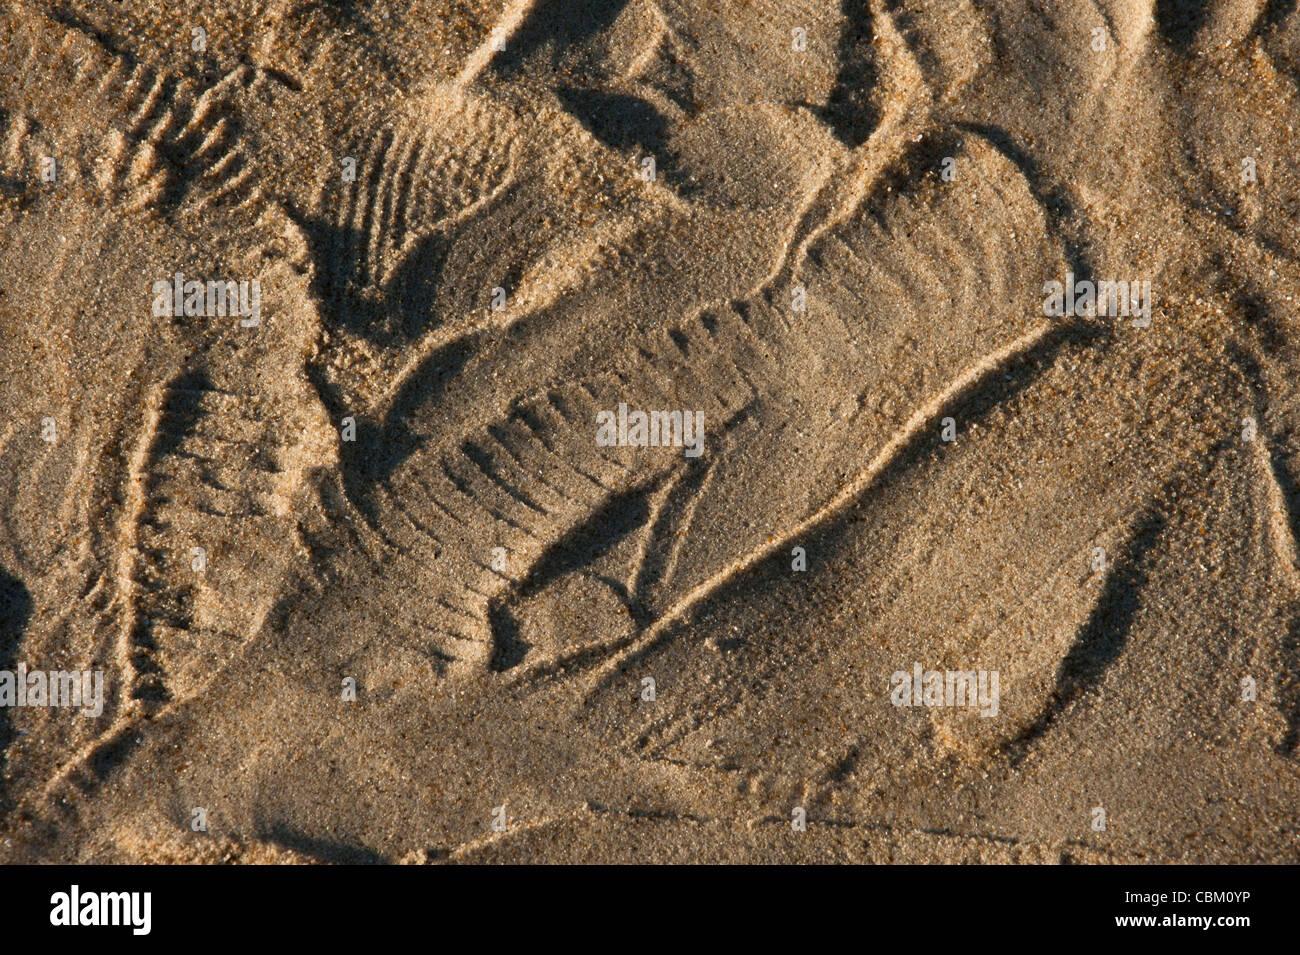 Black-tailed Rattlesnake Tracks (Crotalus molossus), Captive. USA Stock Photo